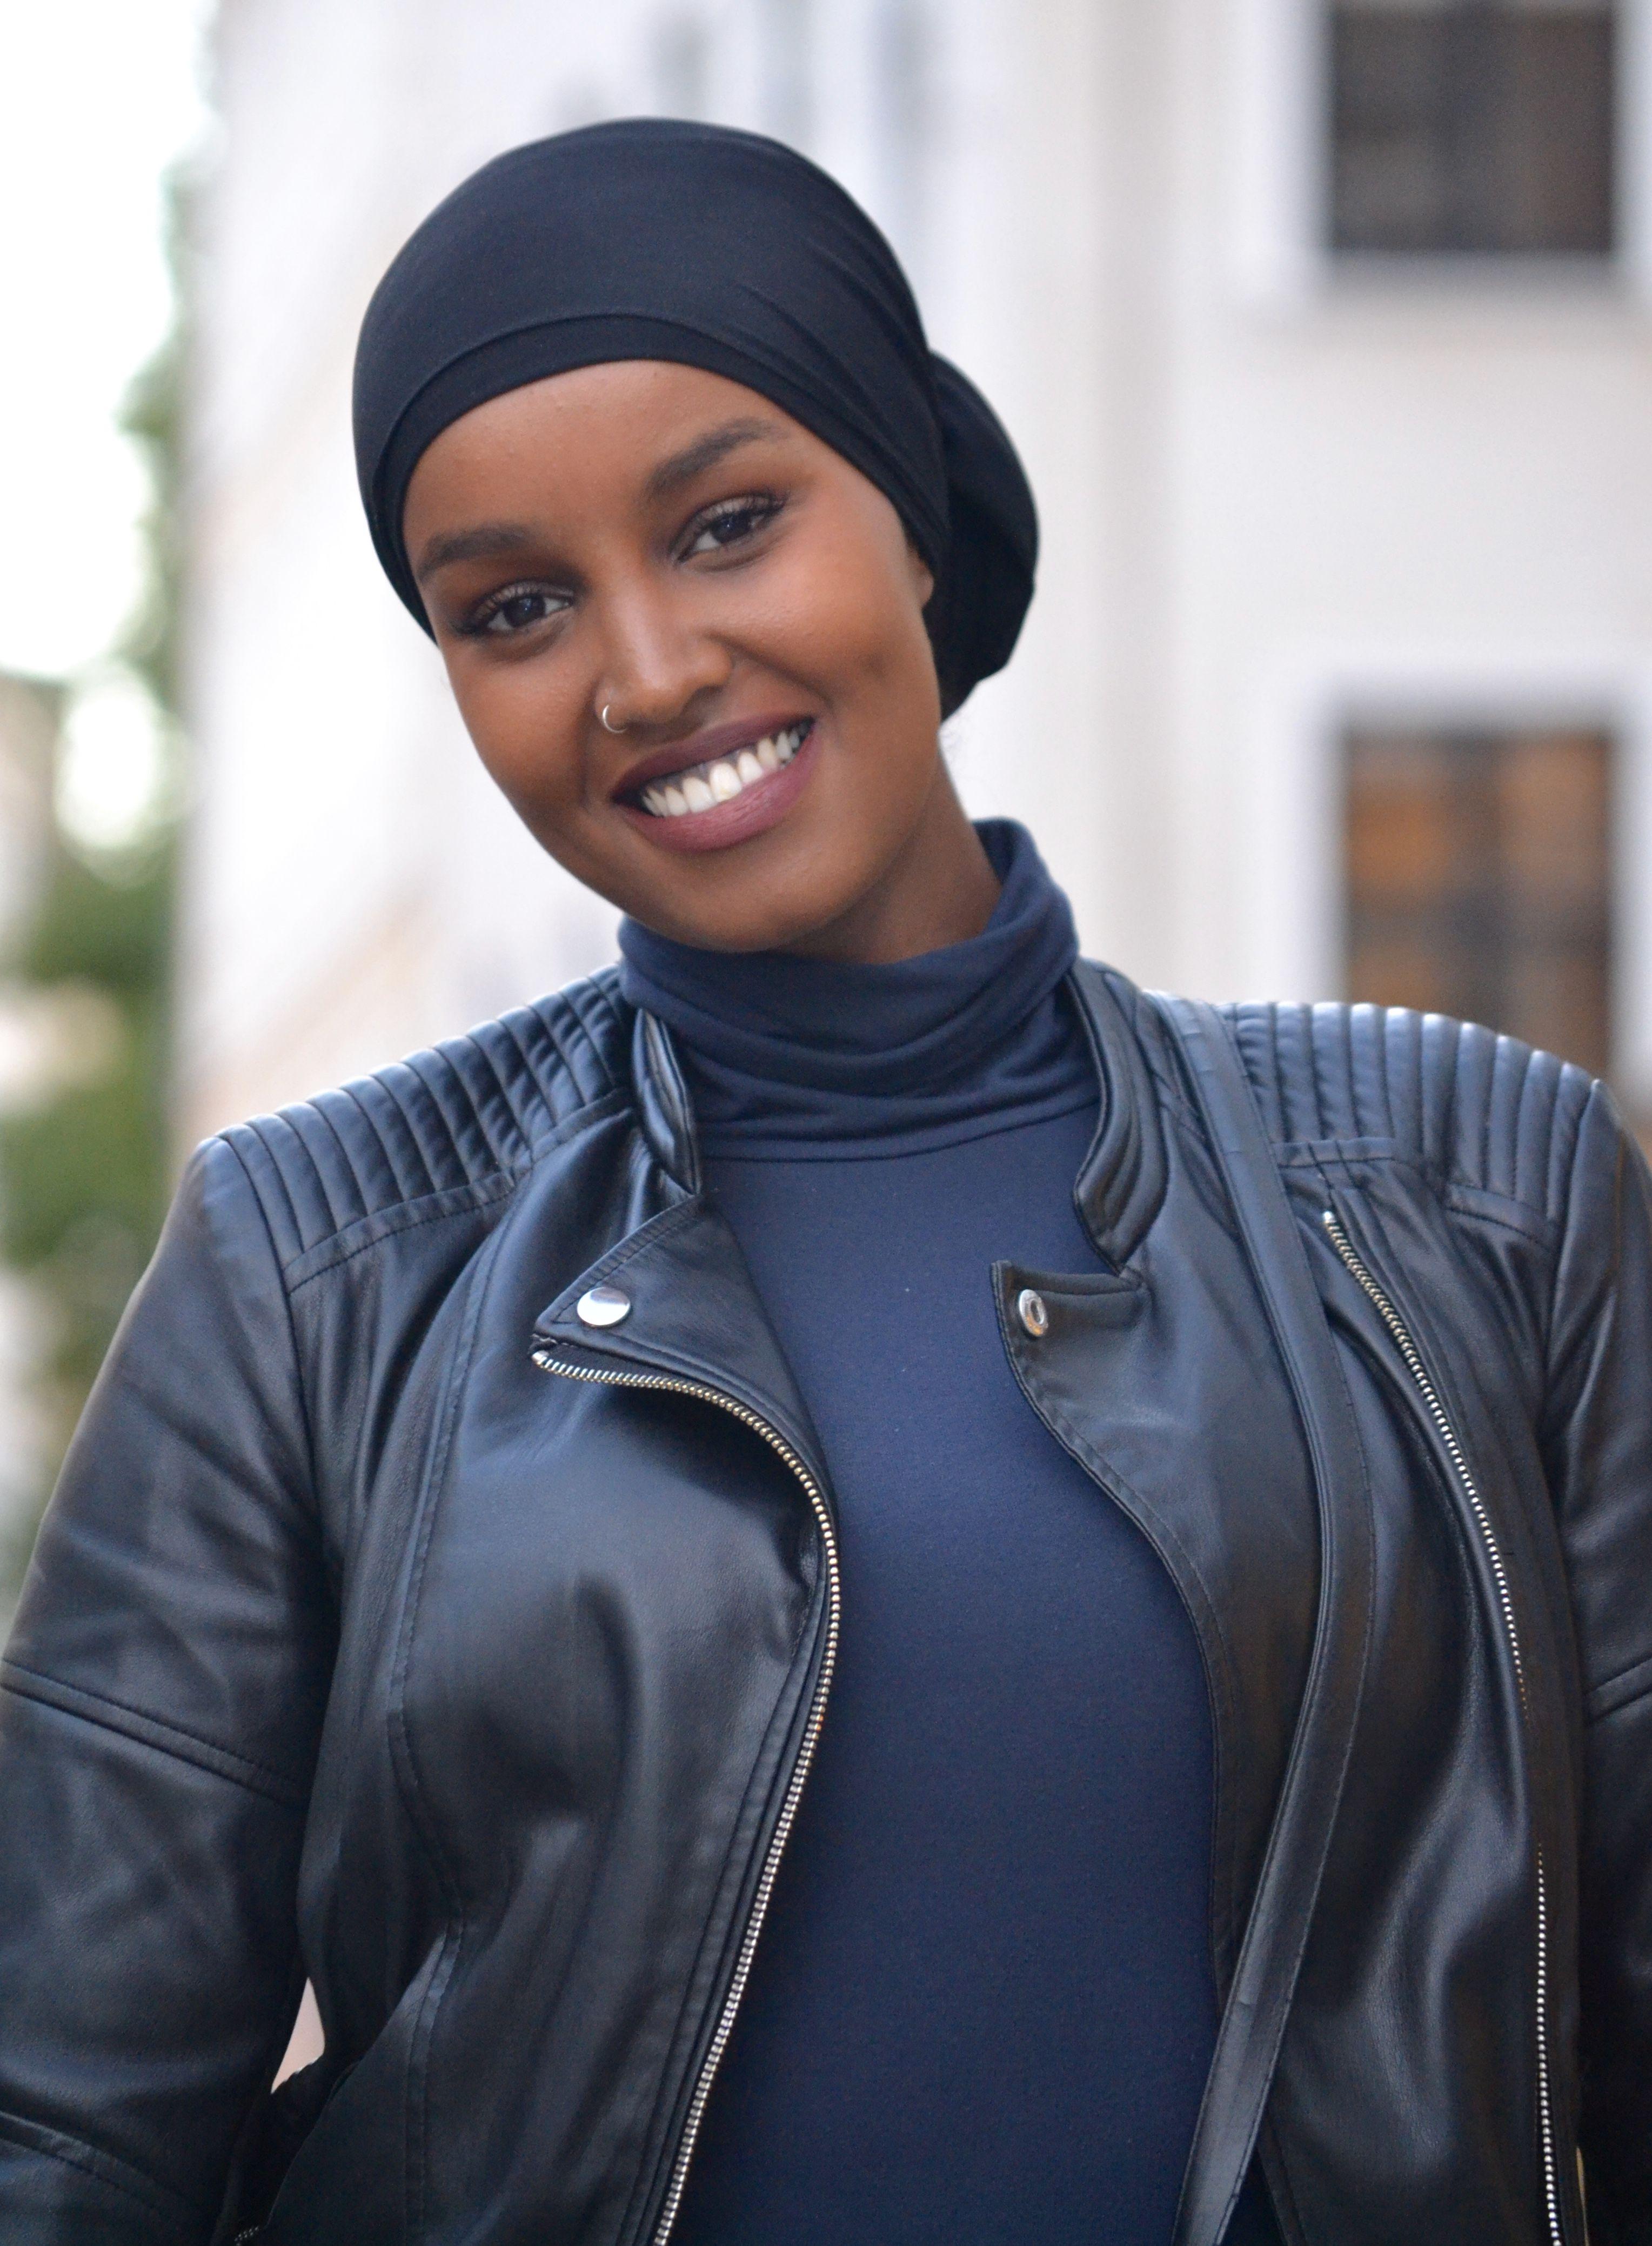 Afro Street Style Afro Danes Scandinavian Fashion Photographer Photography Work